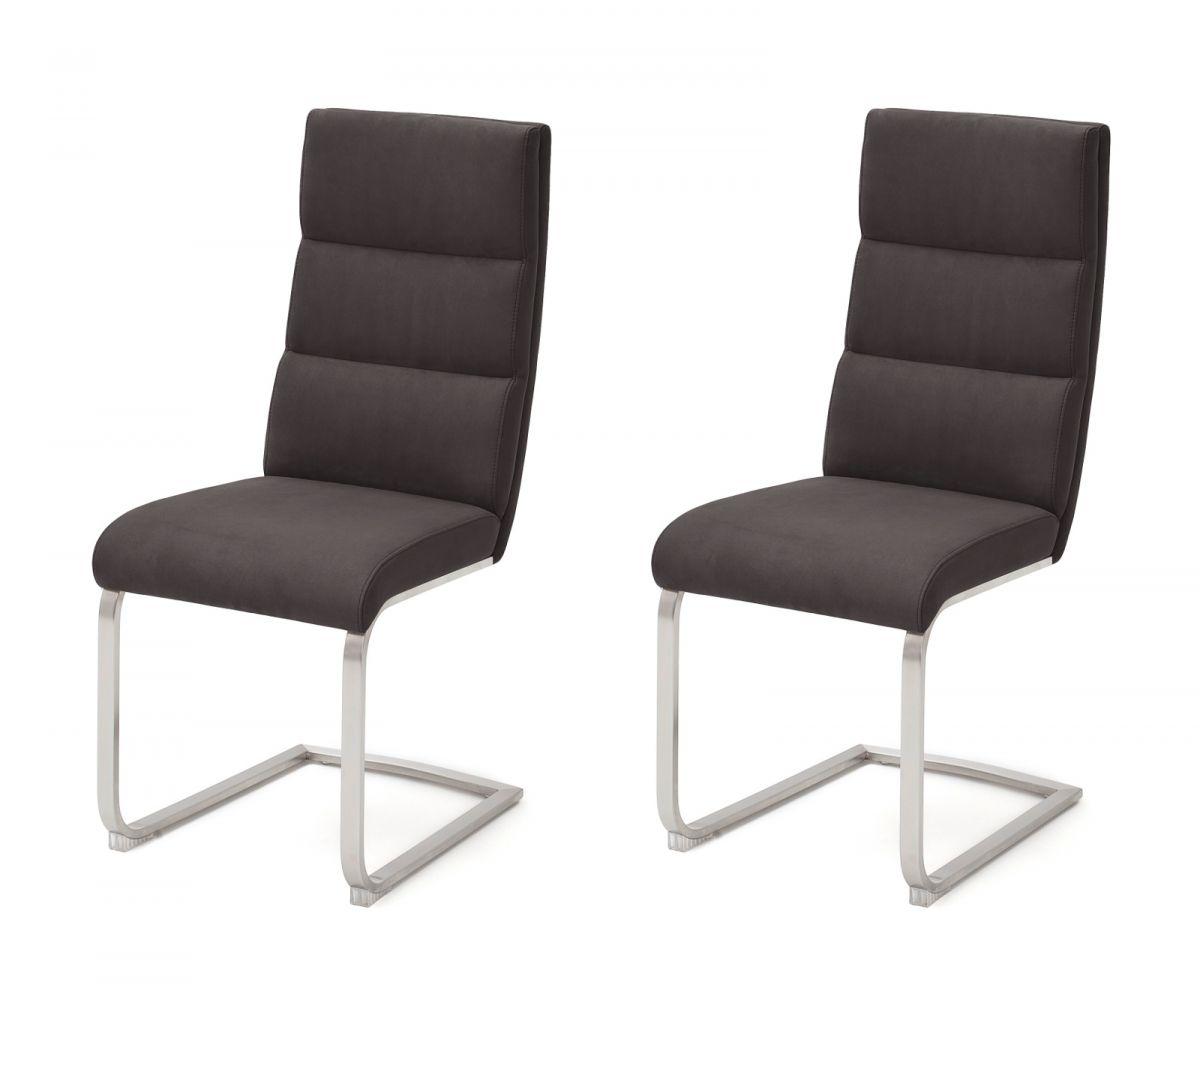 2 x Stuhl Giulia Anthrazit Schwinger Nubuklederoptik